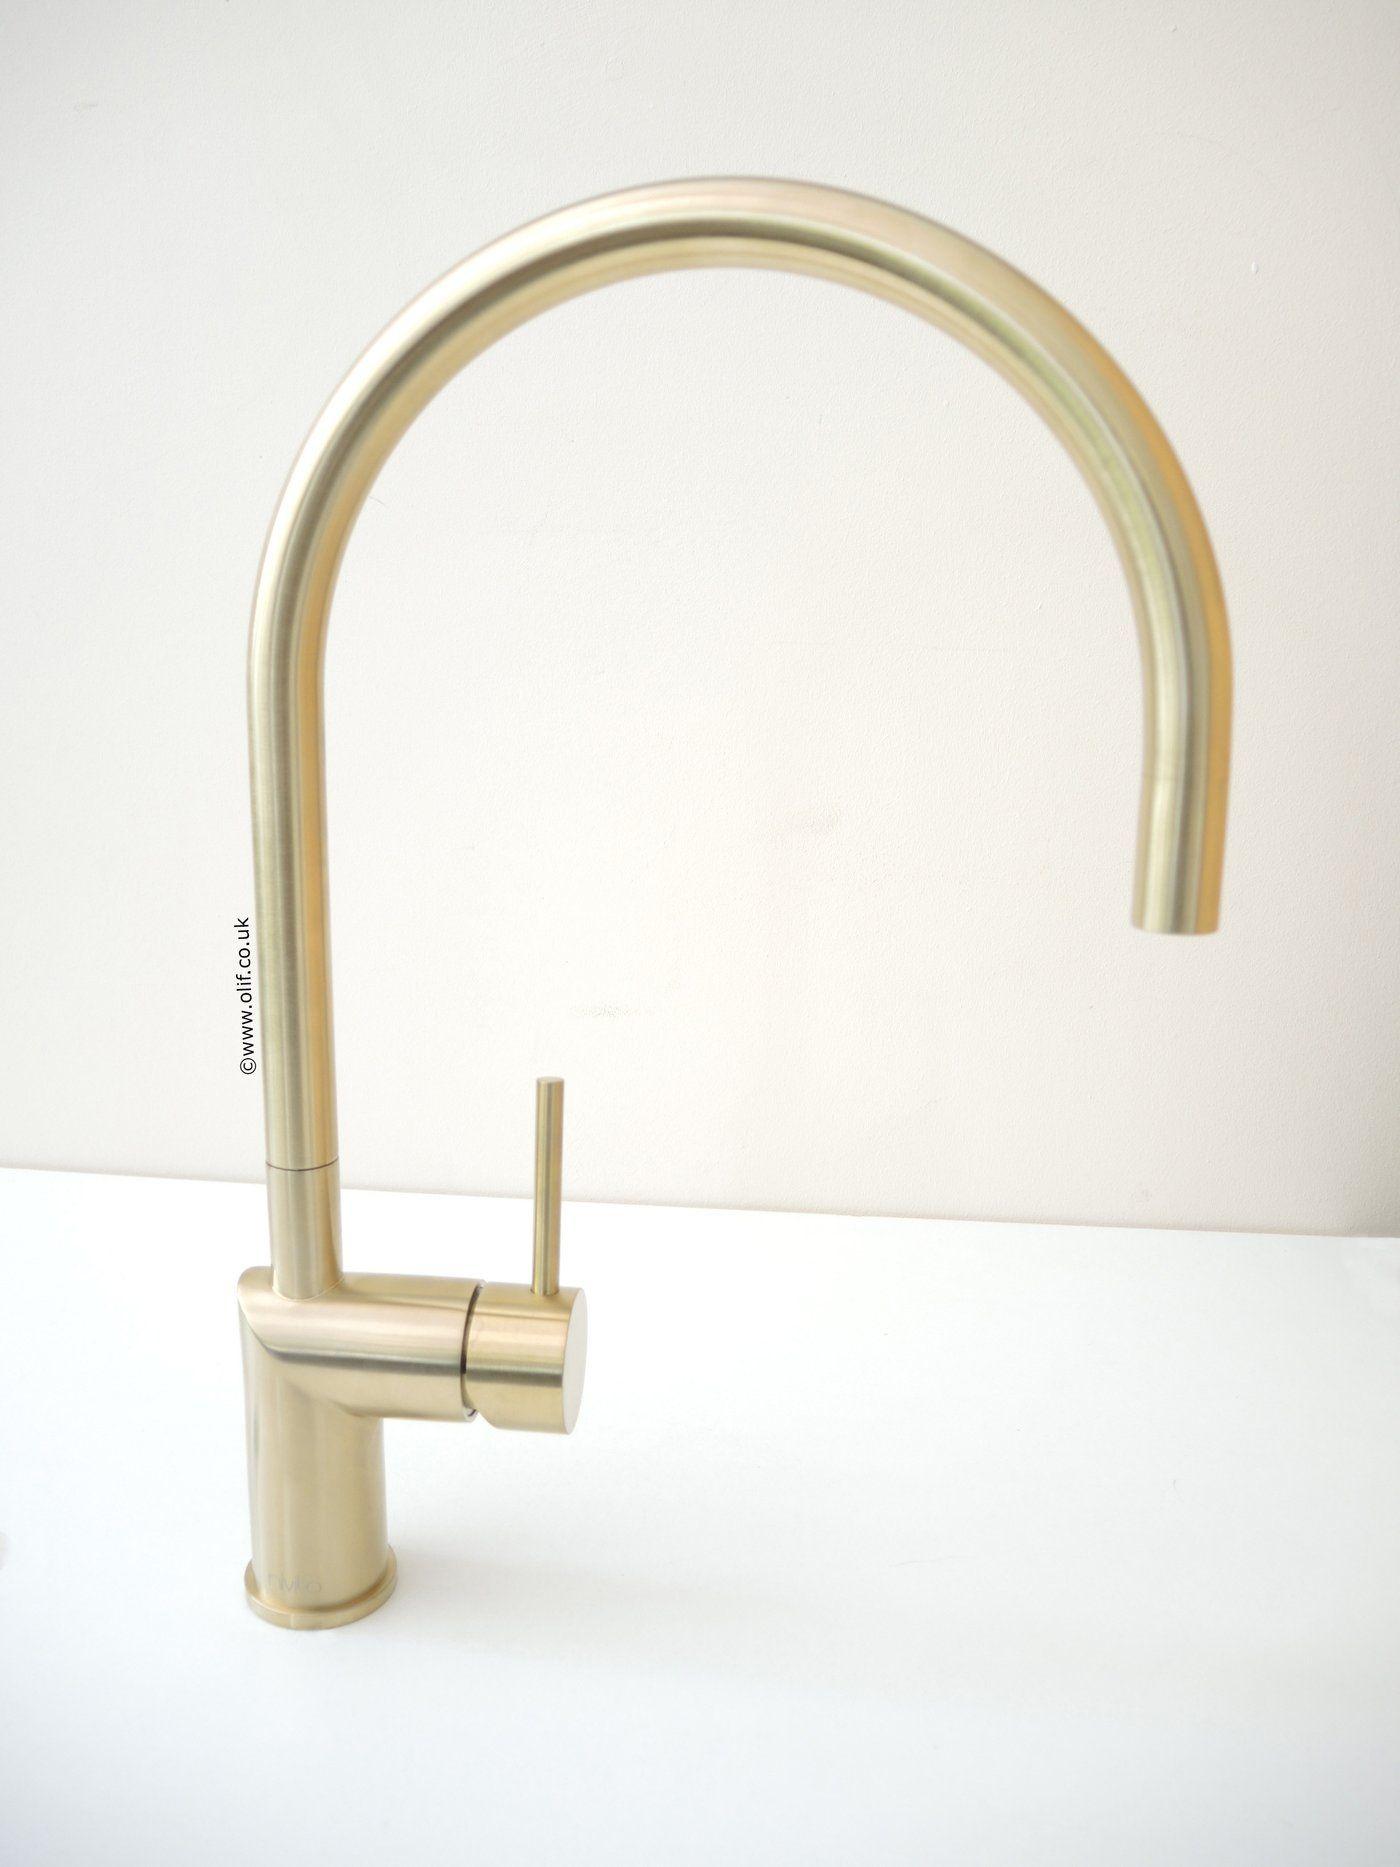 Nivito RH 140 Brushed Brass/Gold, kitchen mixer tap   Mixer taps ...